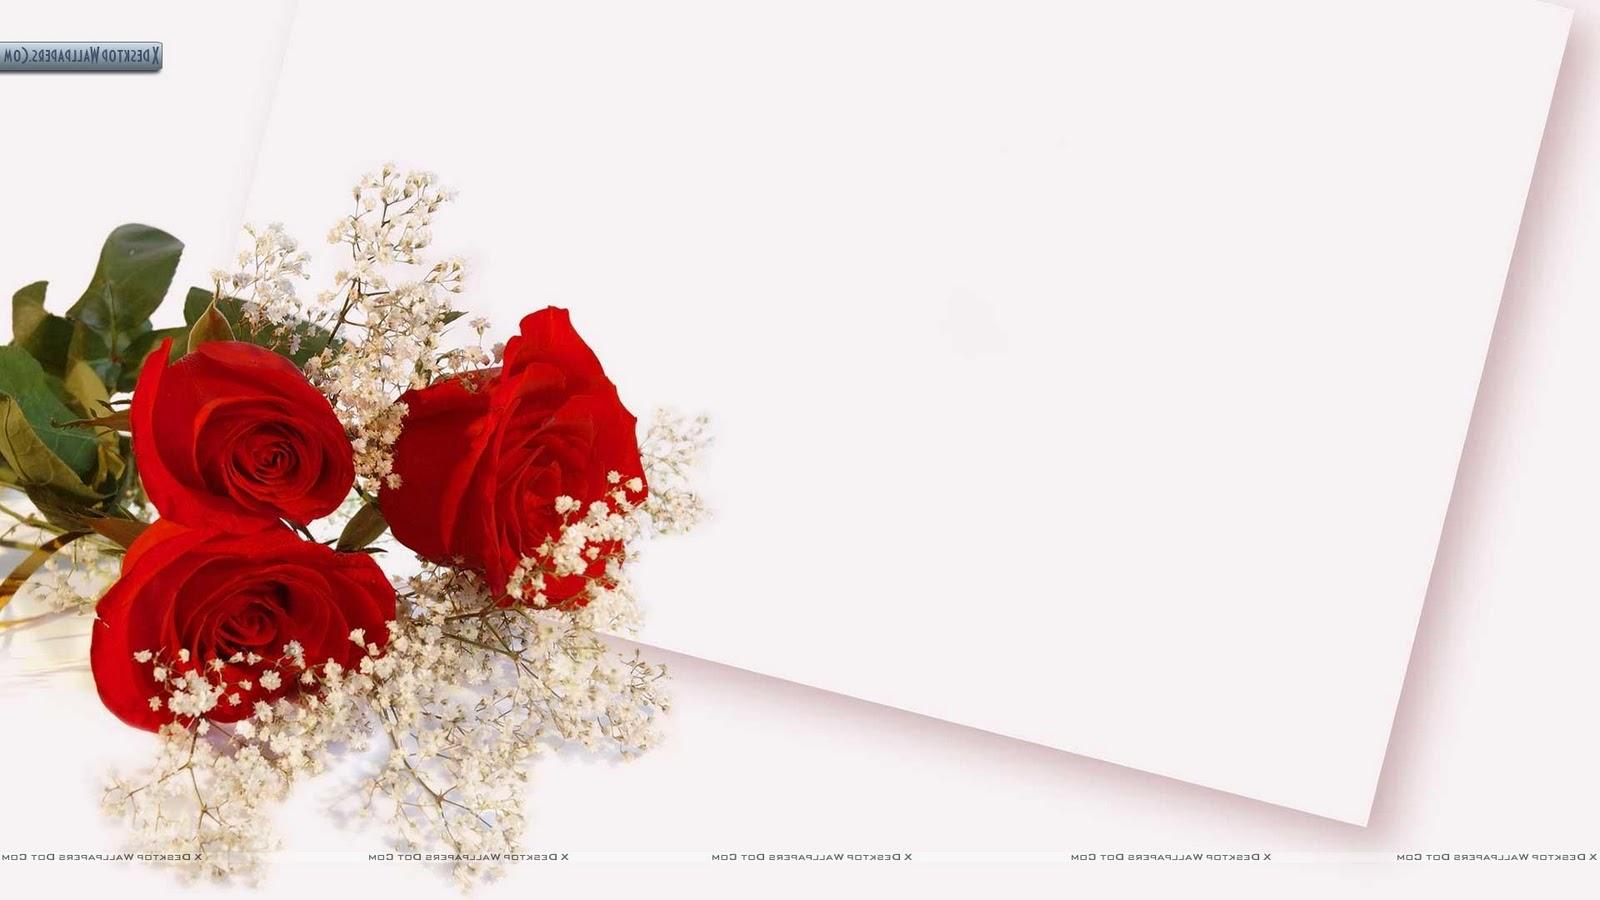 Wedding Flower Backgrounds - WallpaperSafari